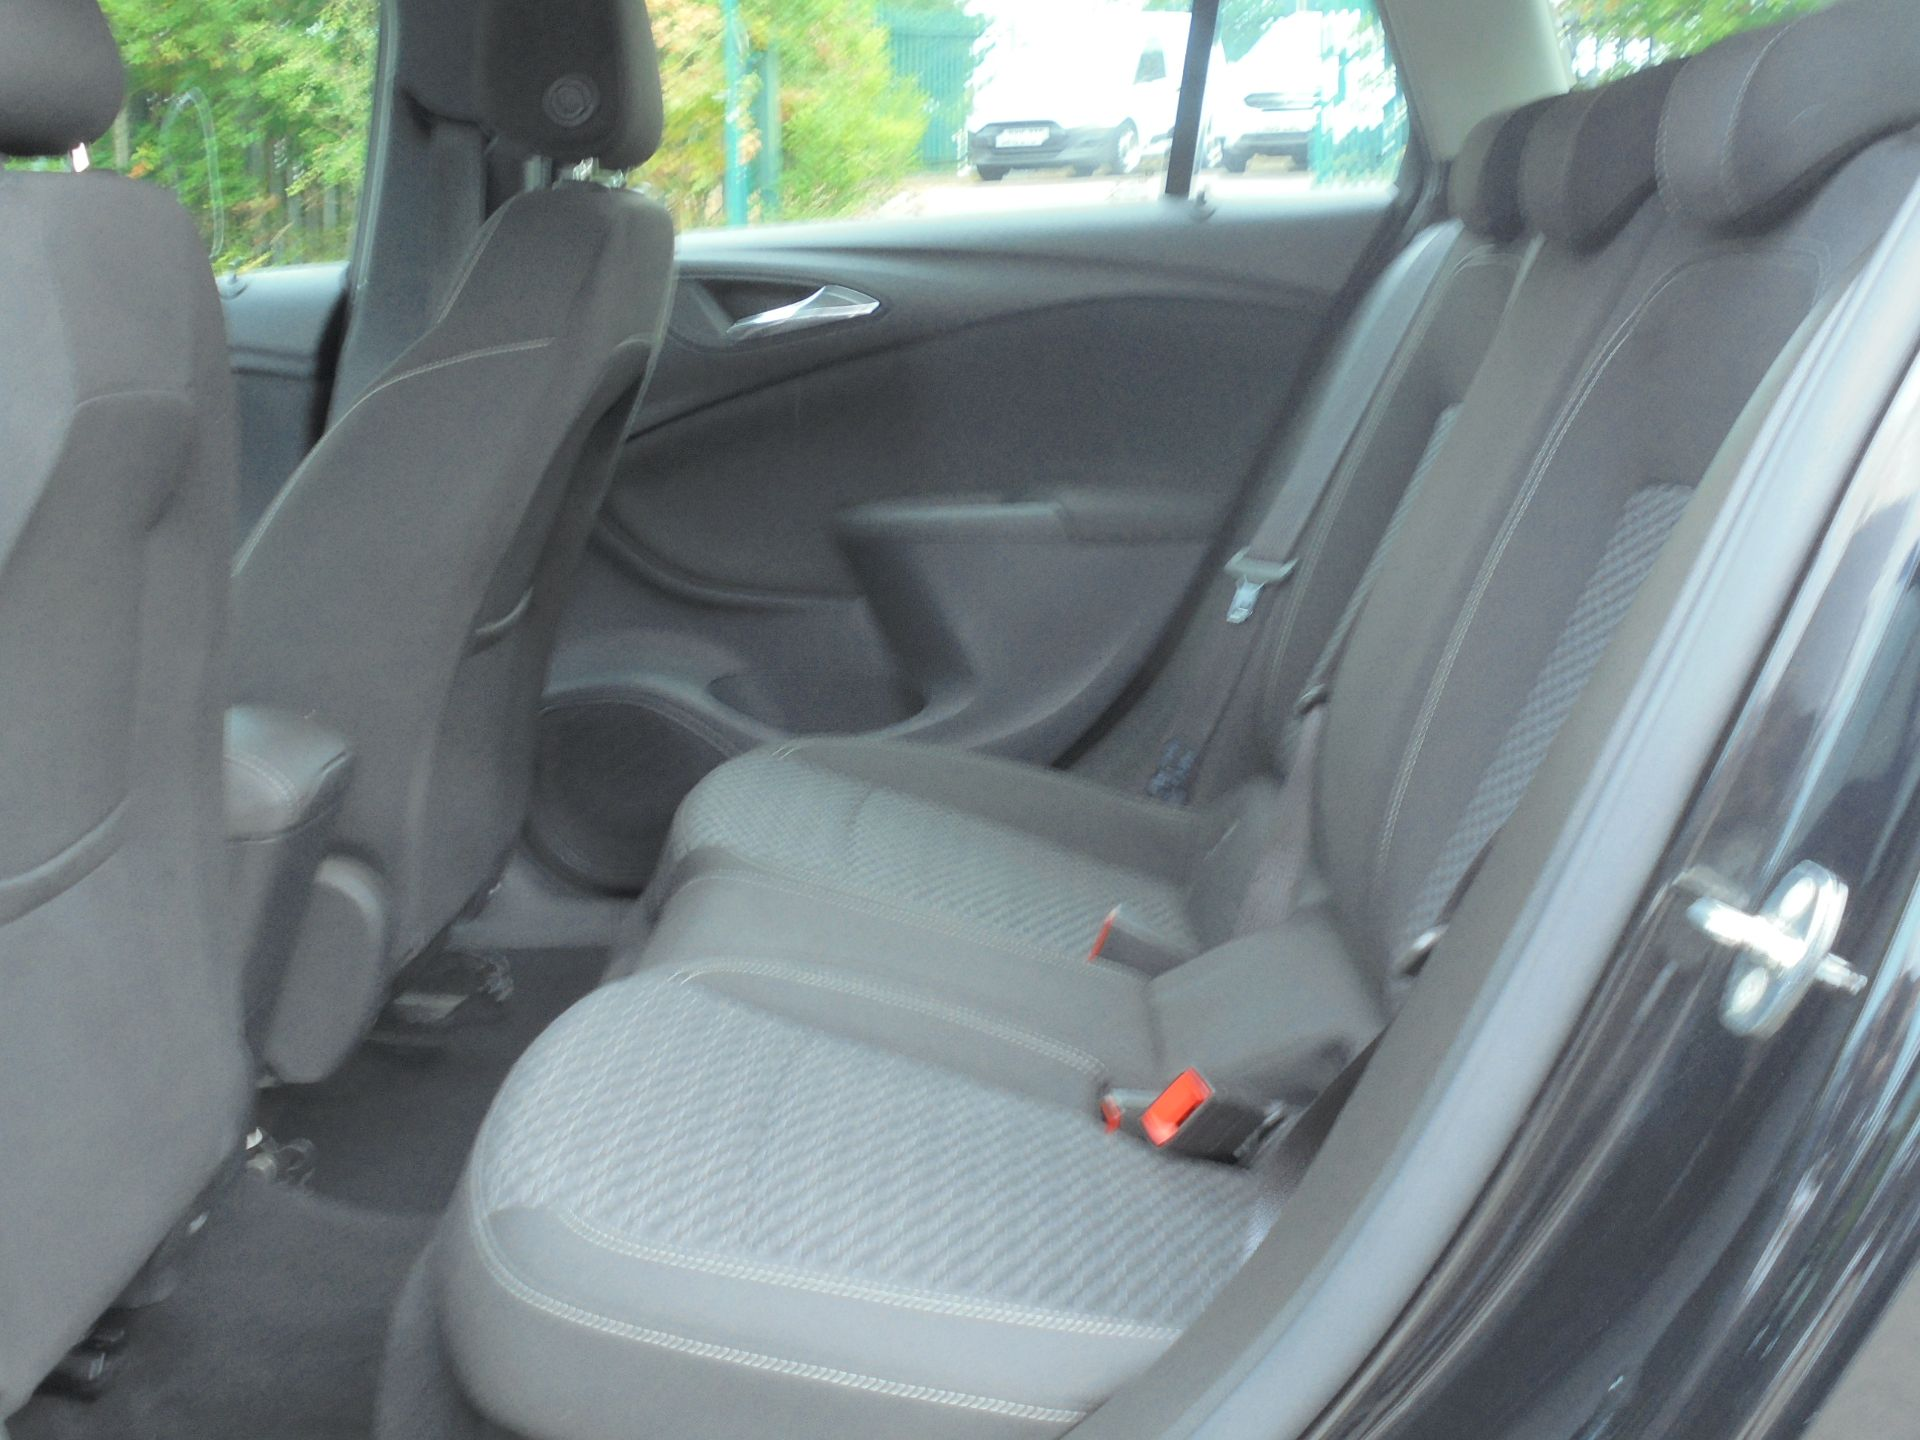 2018 Vauxhall Astra Sports Tourer 1.6 Cdti 16V 136 Sri Nav 5Dr (VU18DFJ) Image 6